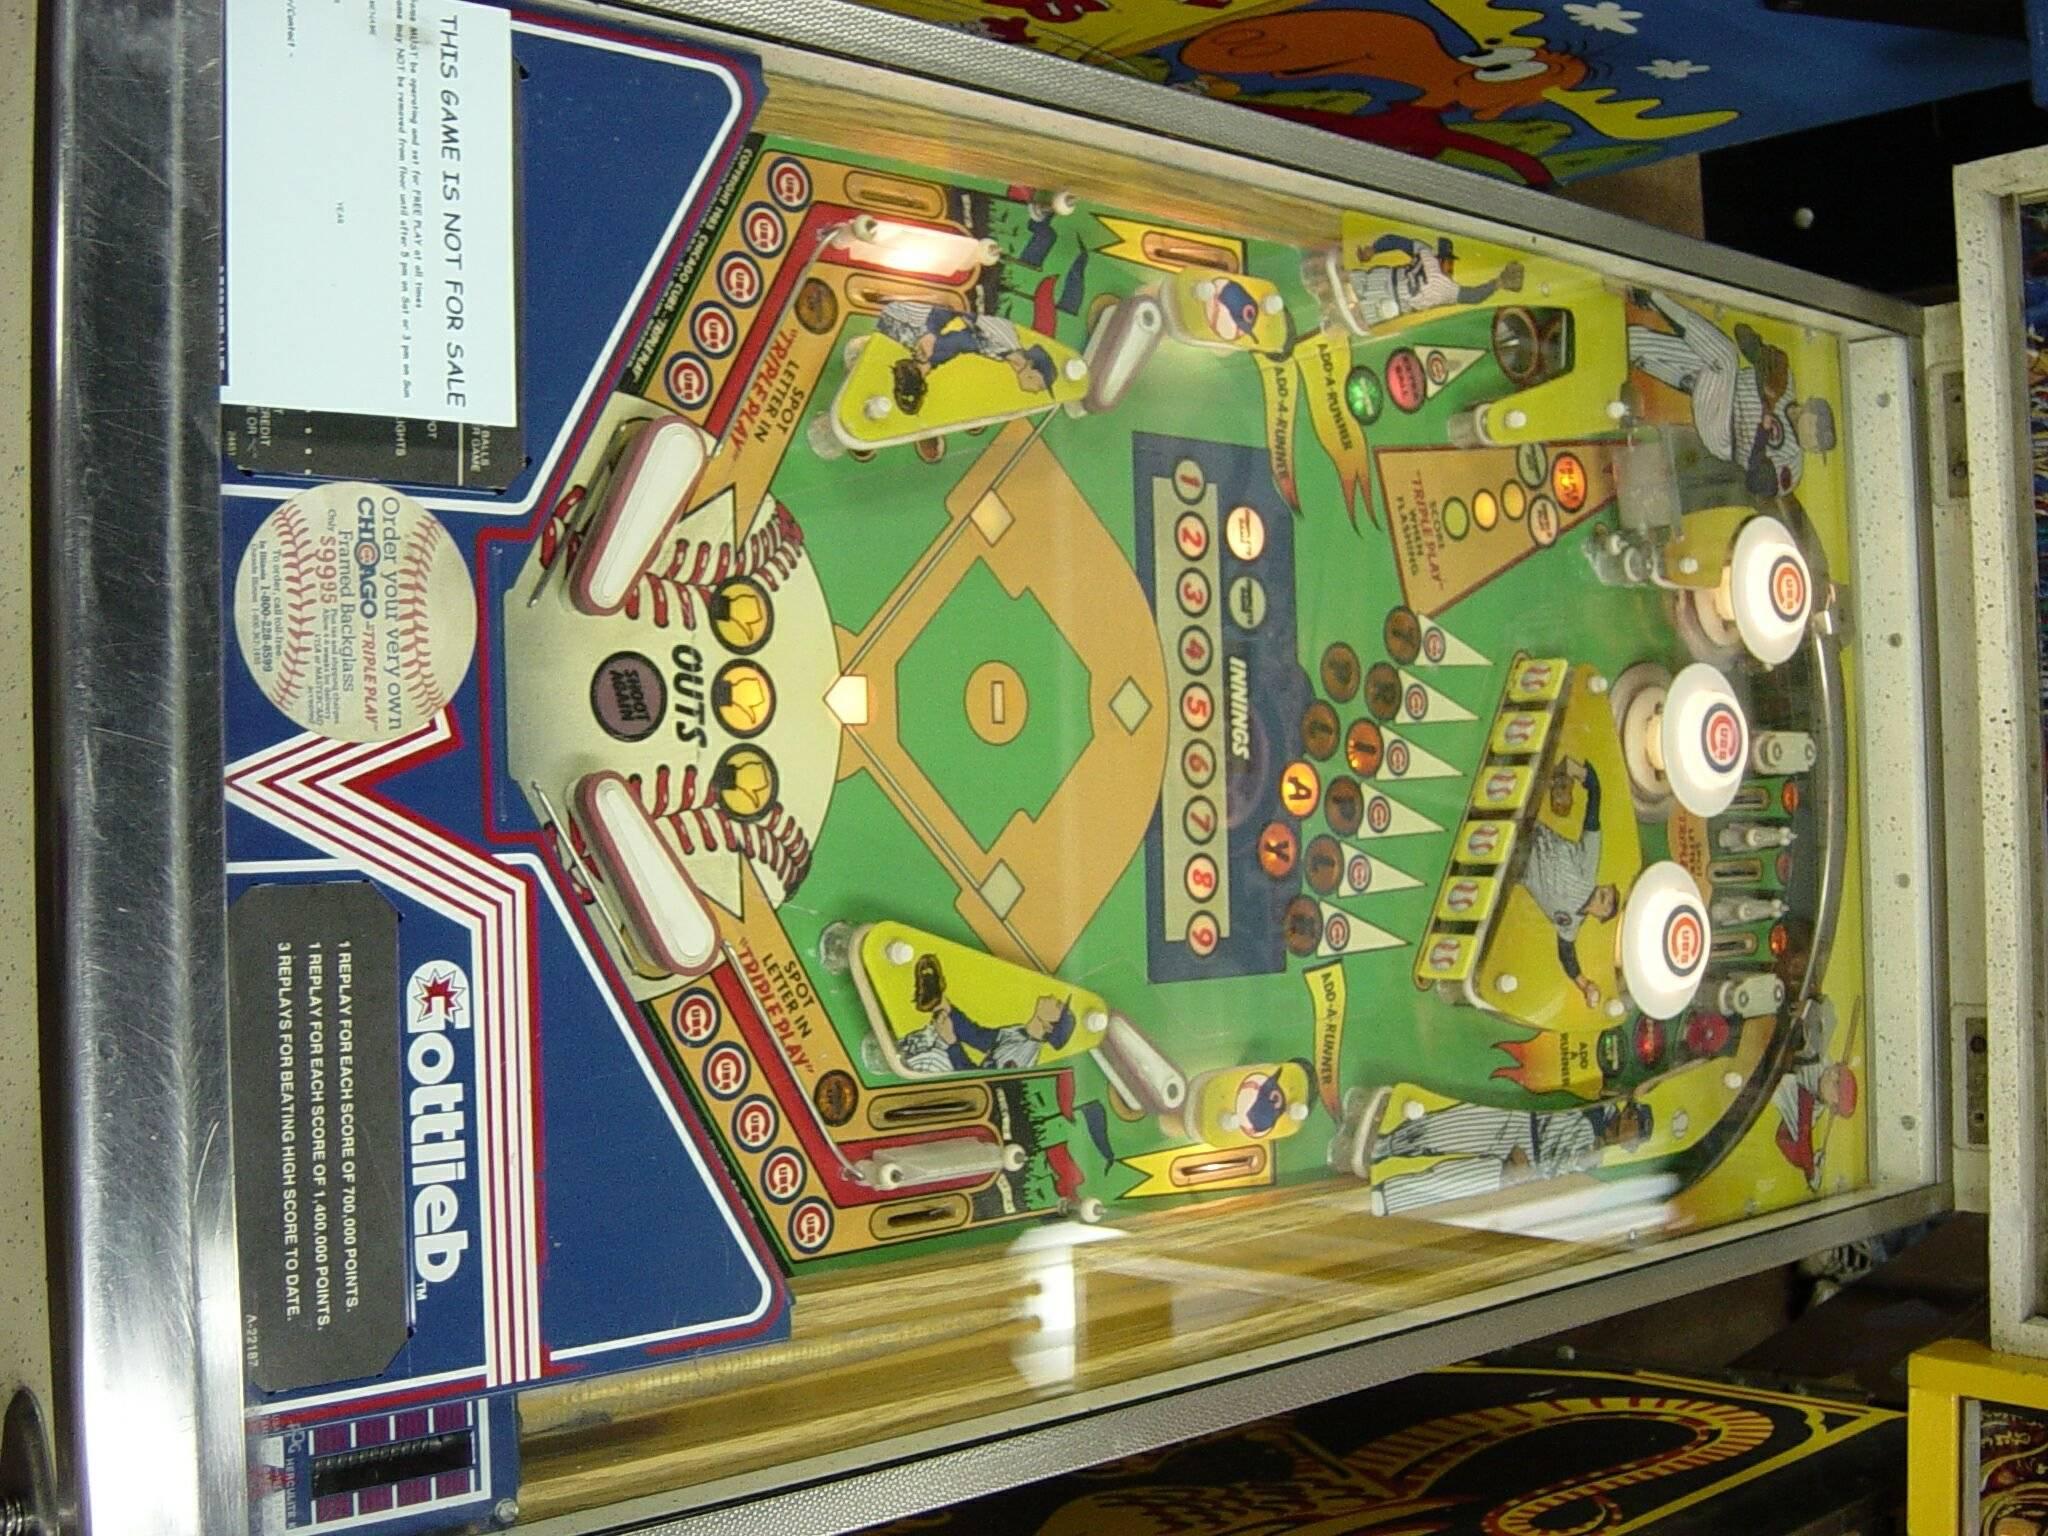 chicago cubs pinball machine